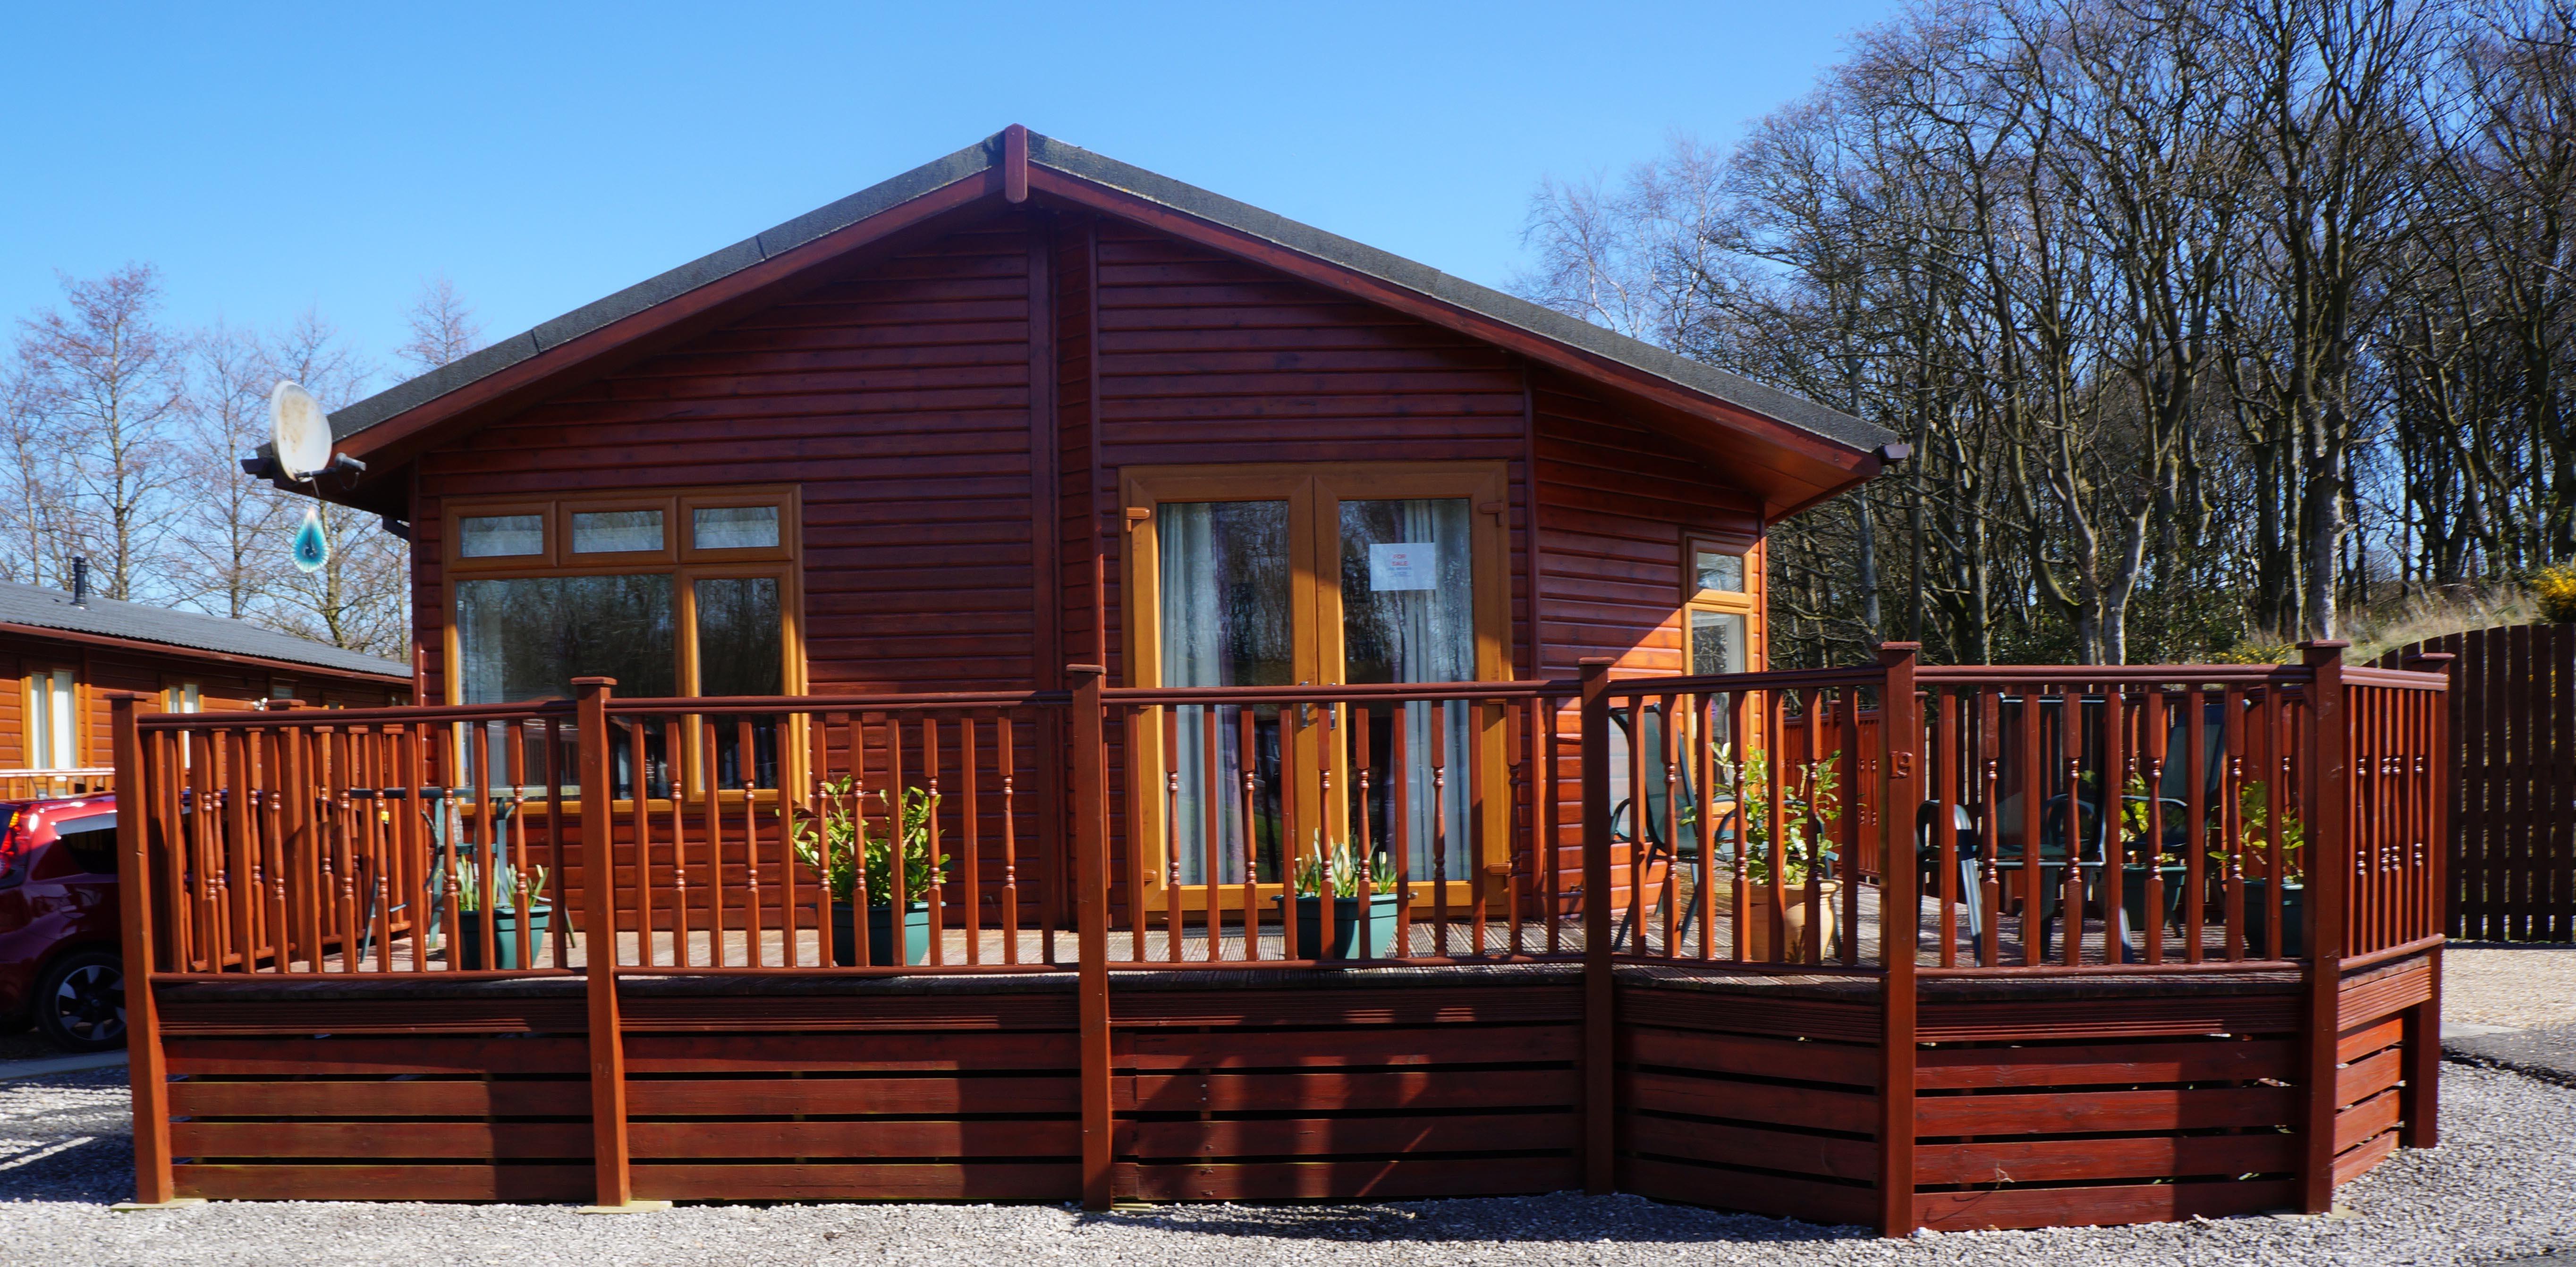 2 Bedroom Lodge Overlooking Ornamental Pond For Sale £85,000